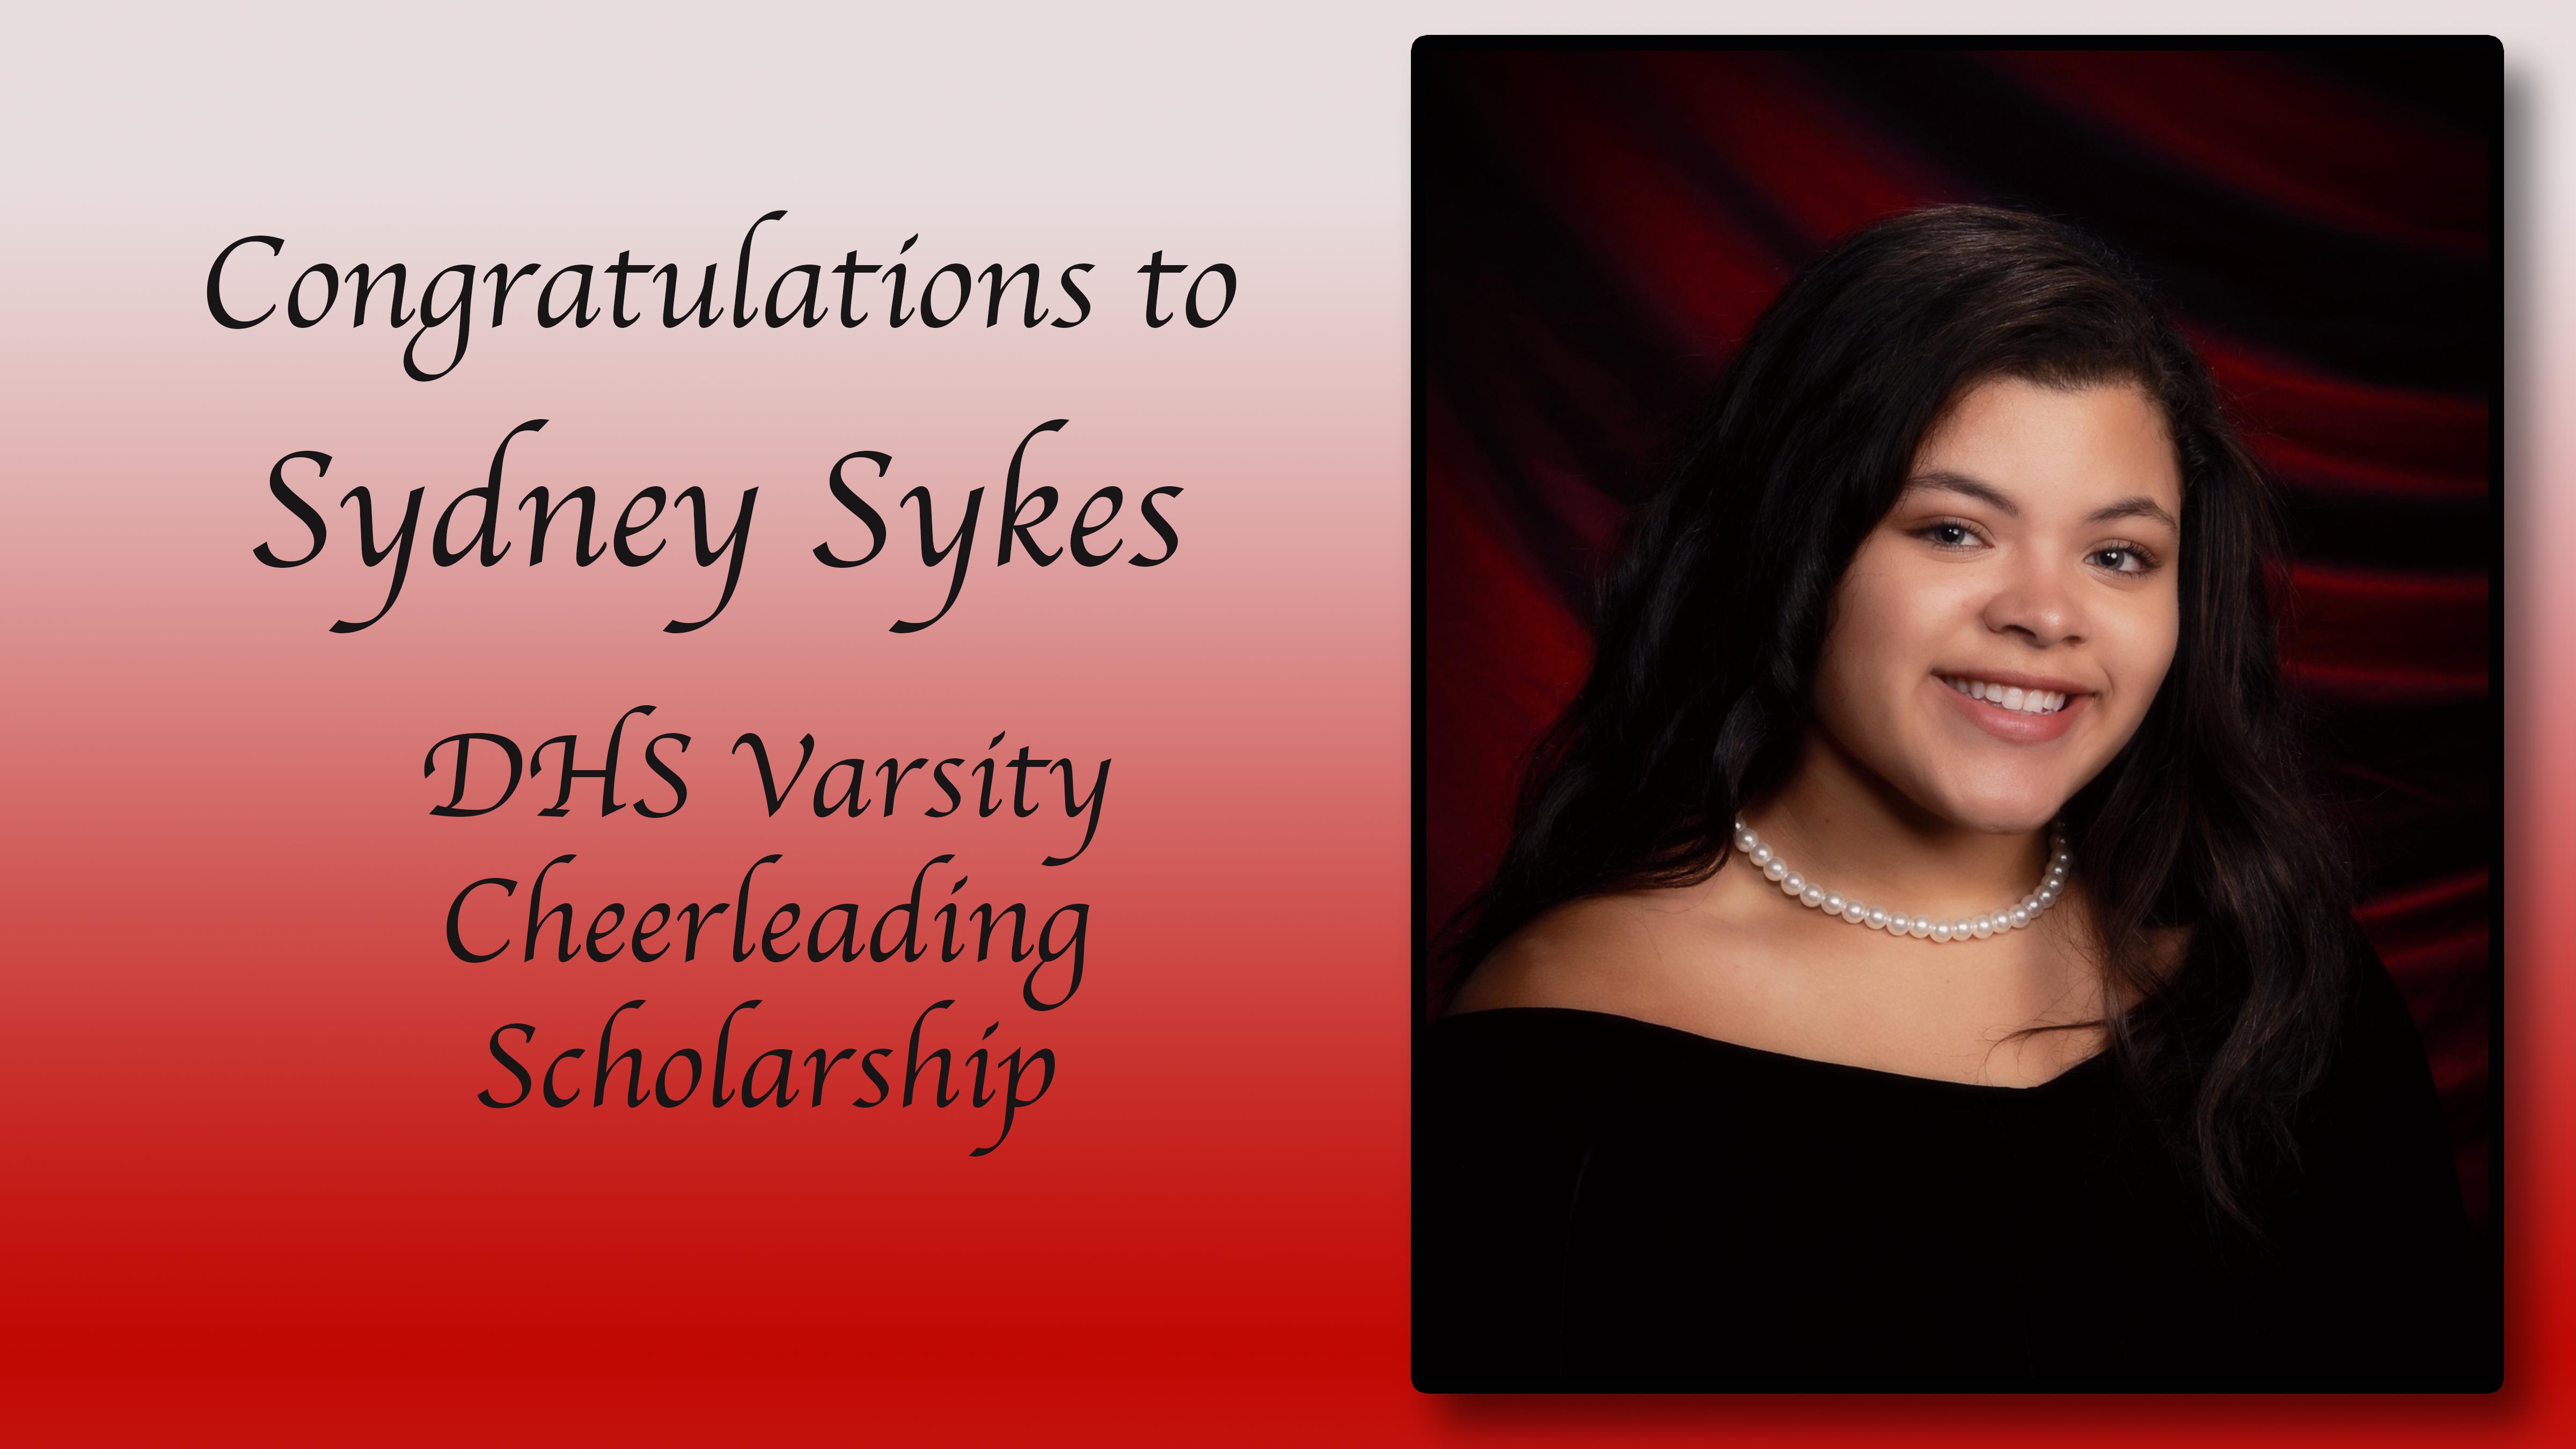 Sydney Sykes scholarship